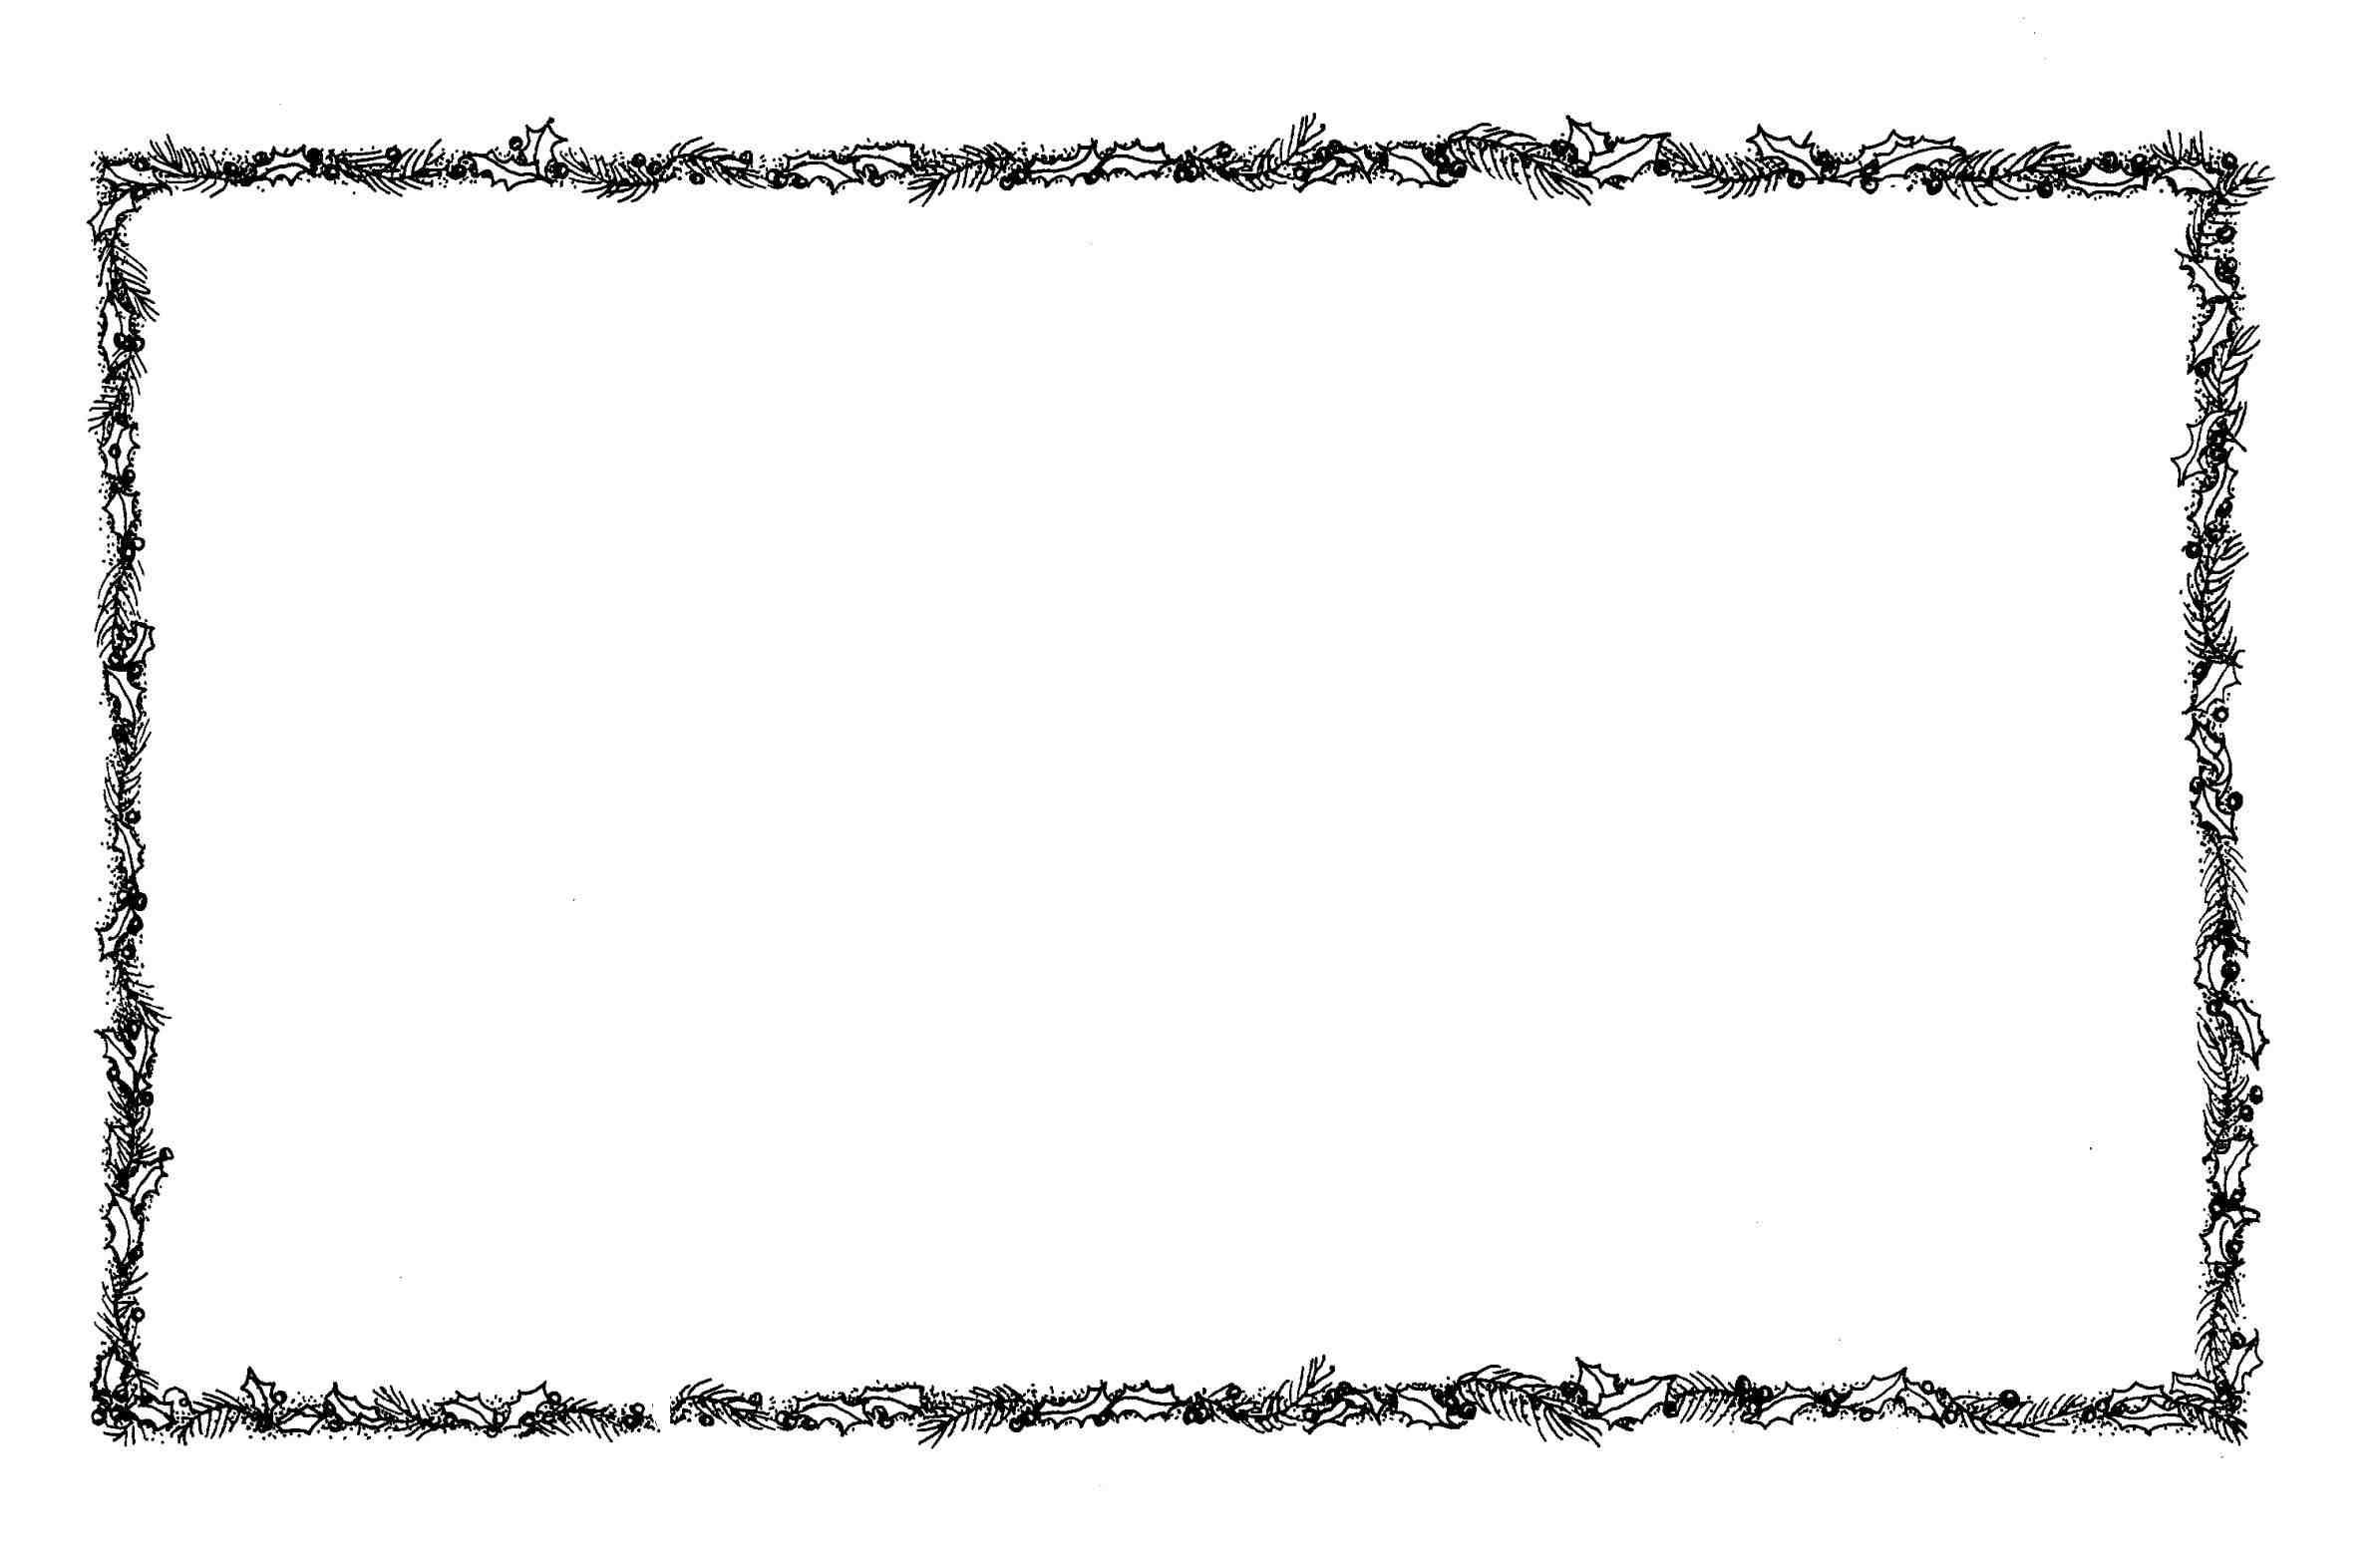 2387x1568 Clip Art Xtras S Christmas Clipart Black And White Border Xtras